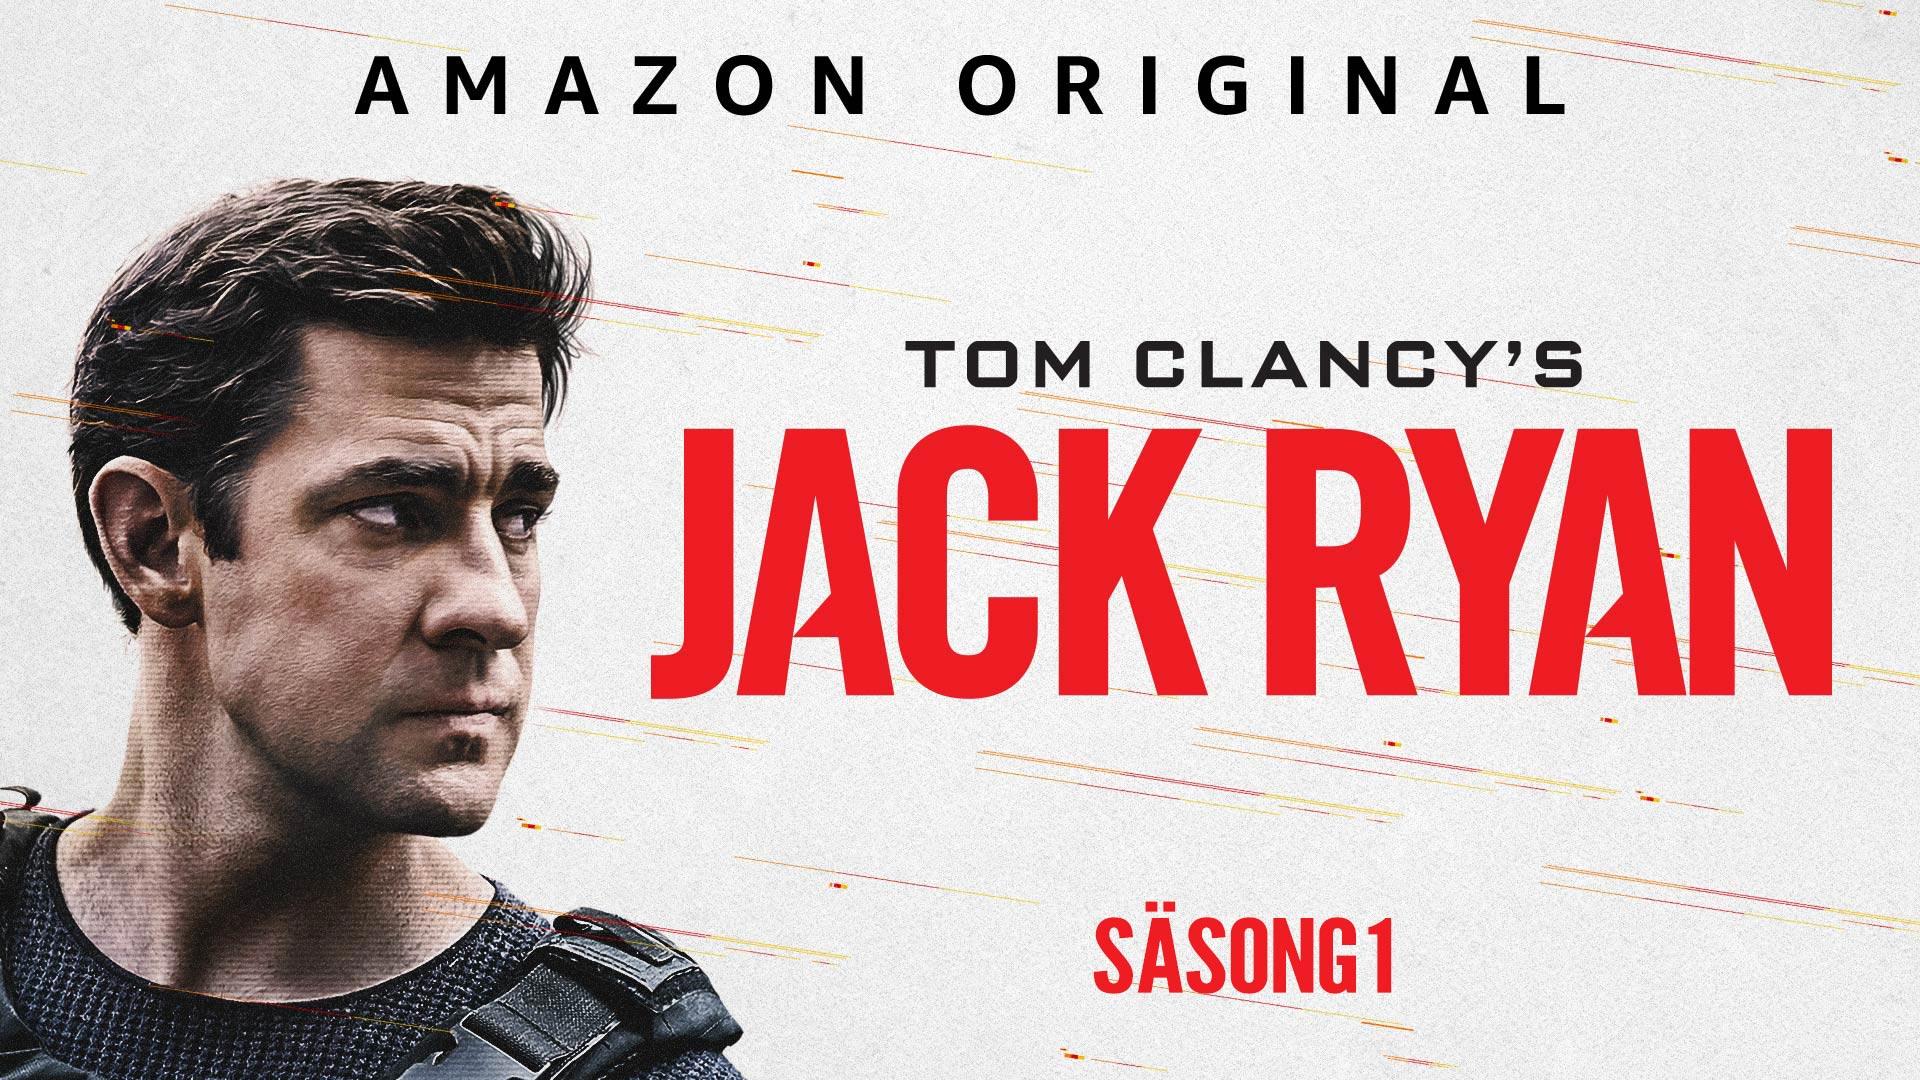 Tom Clancys Jack Ryan - Säsong 1